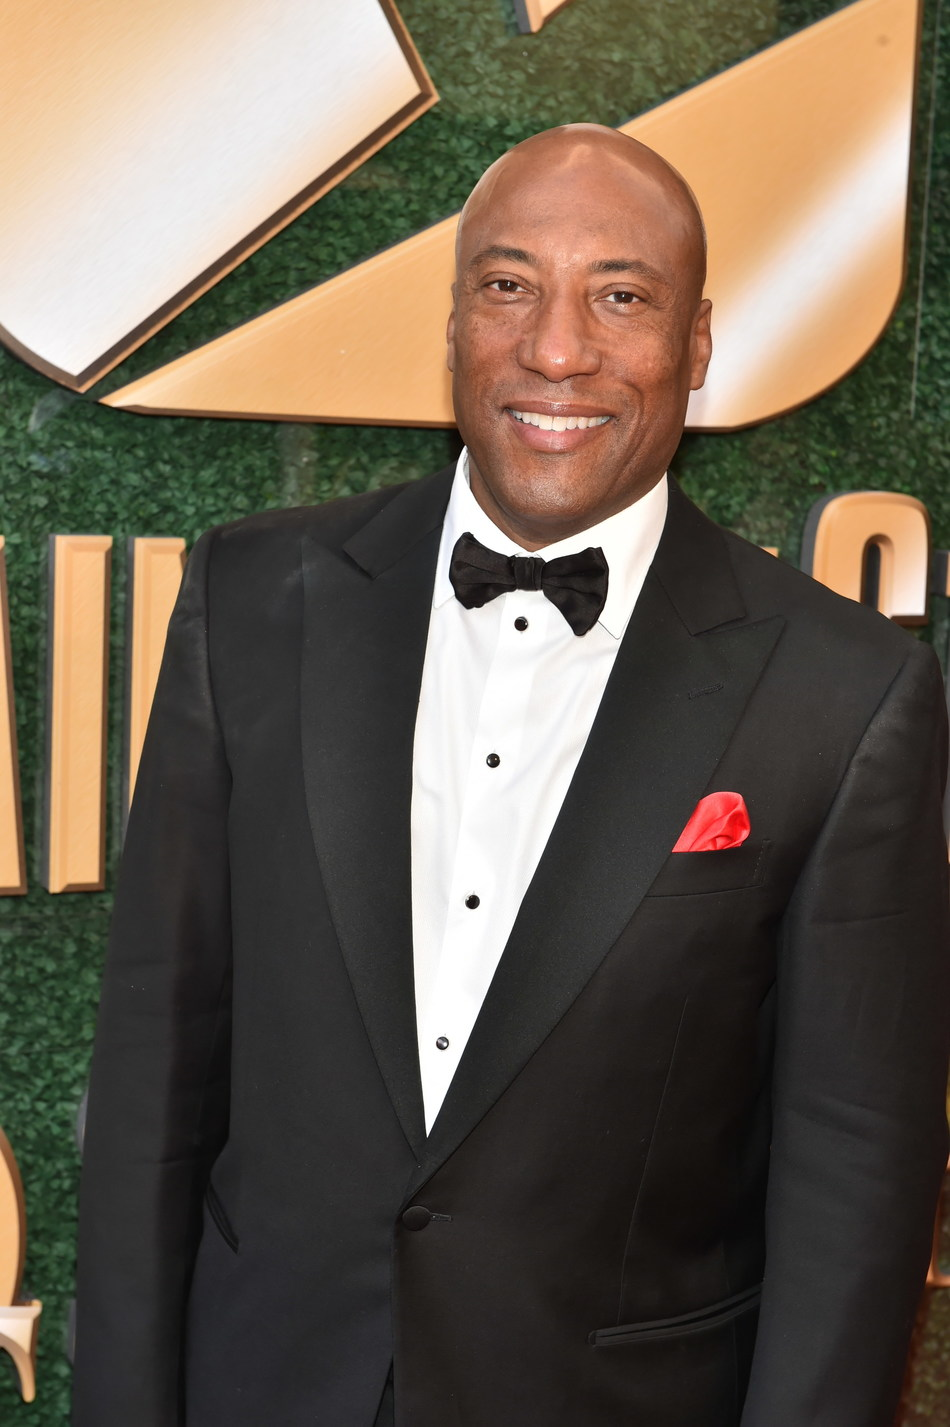 Byron Allen, Founder/Chairman/CEO of Entertainment Studios/Allen Media